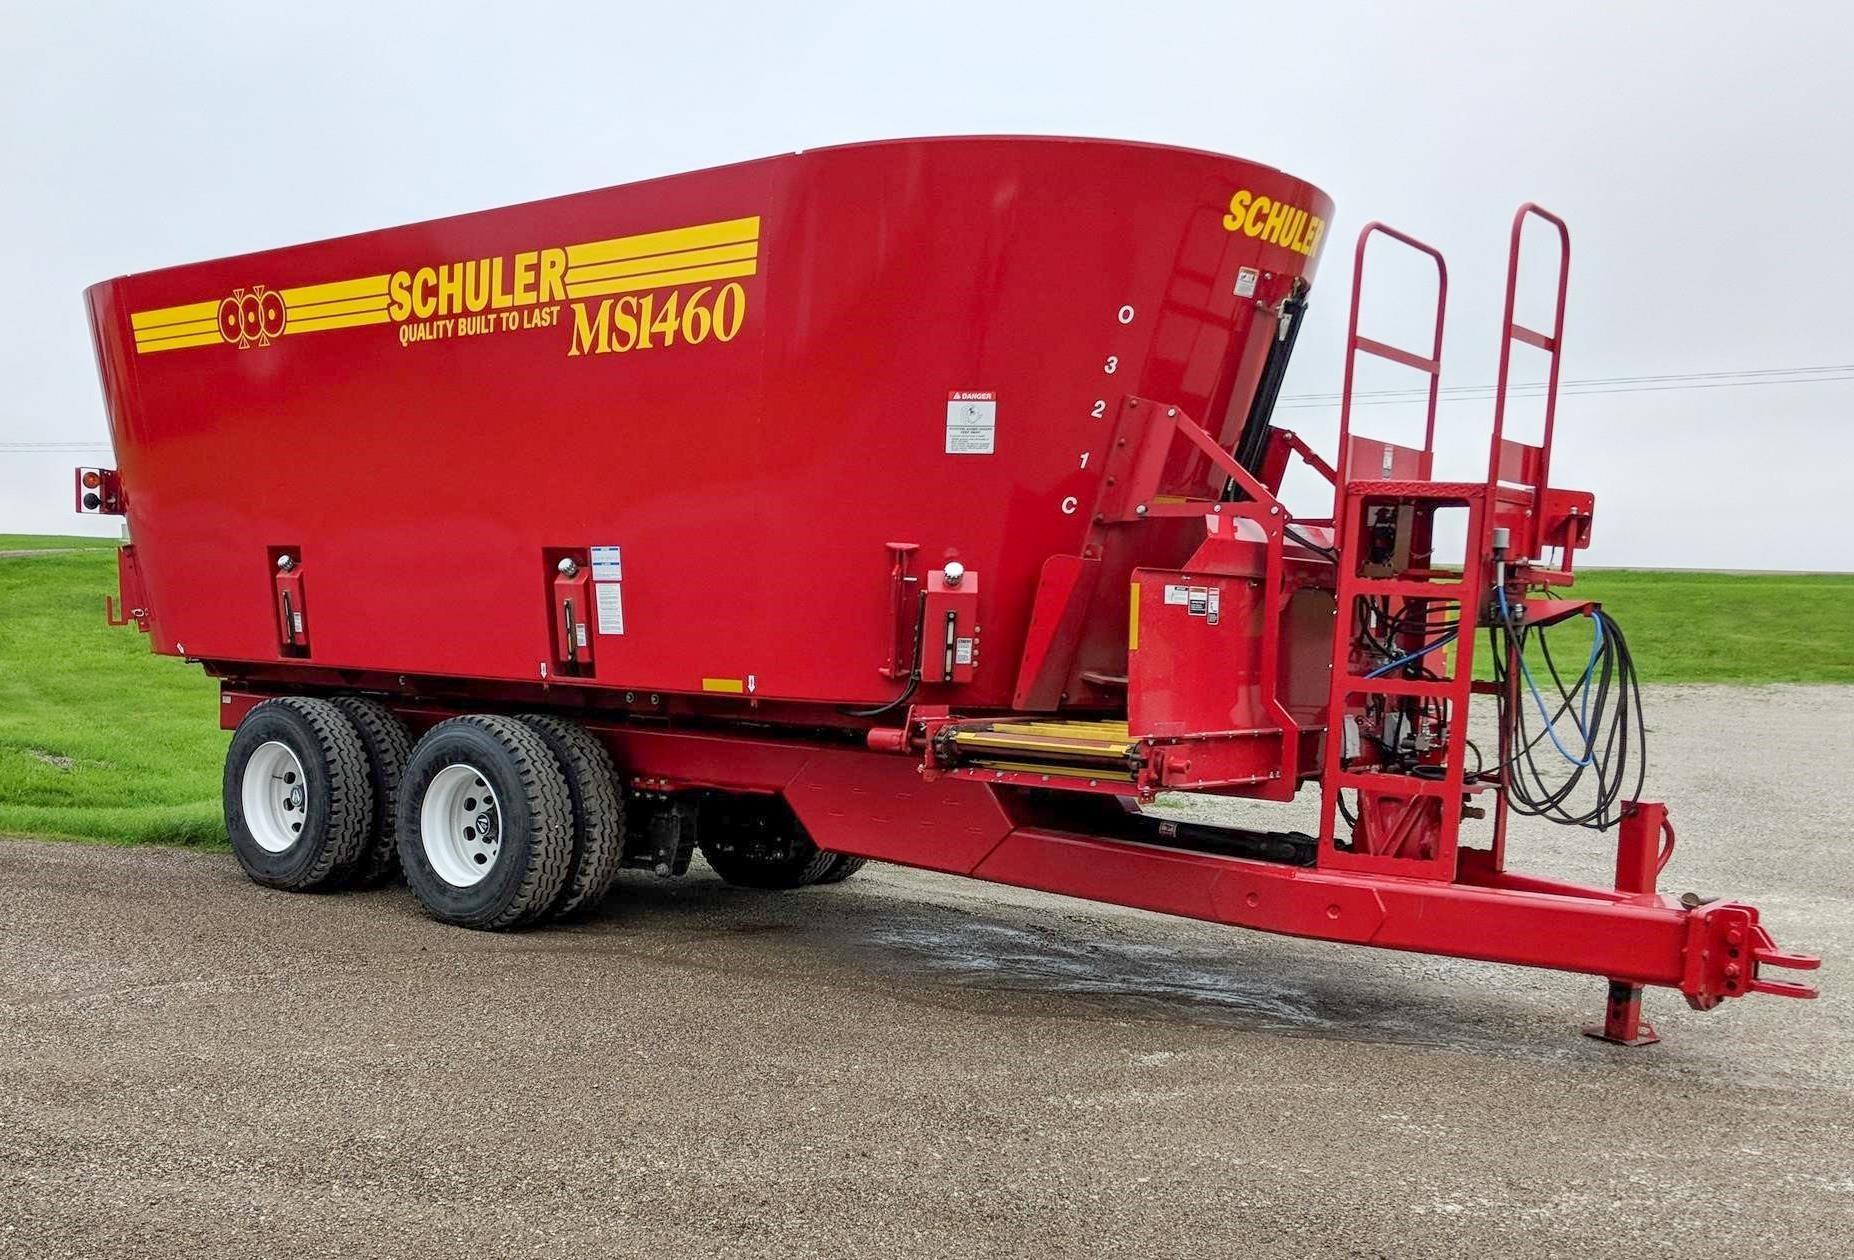 2020 Schuler MS1460 Feed Wagon